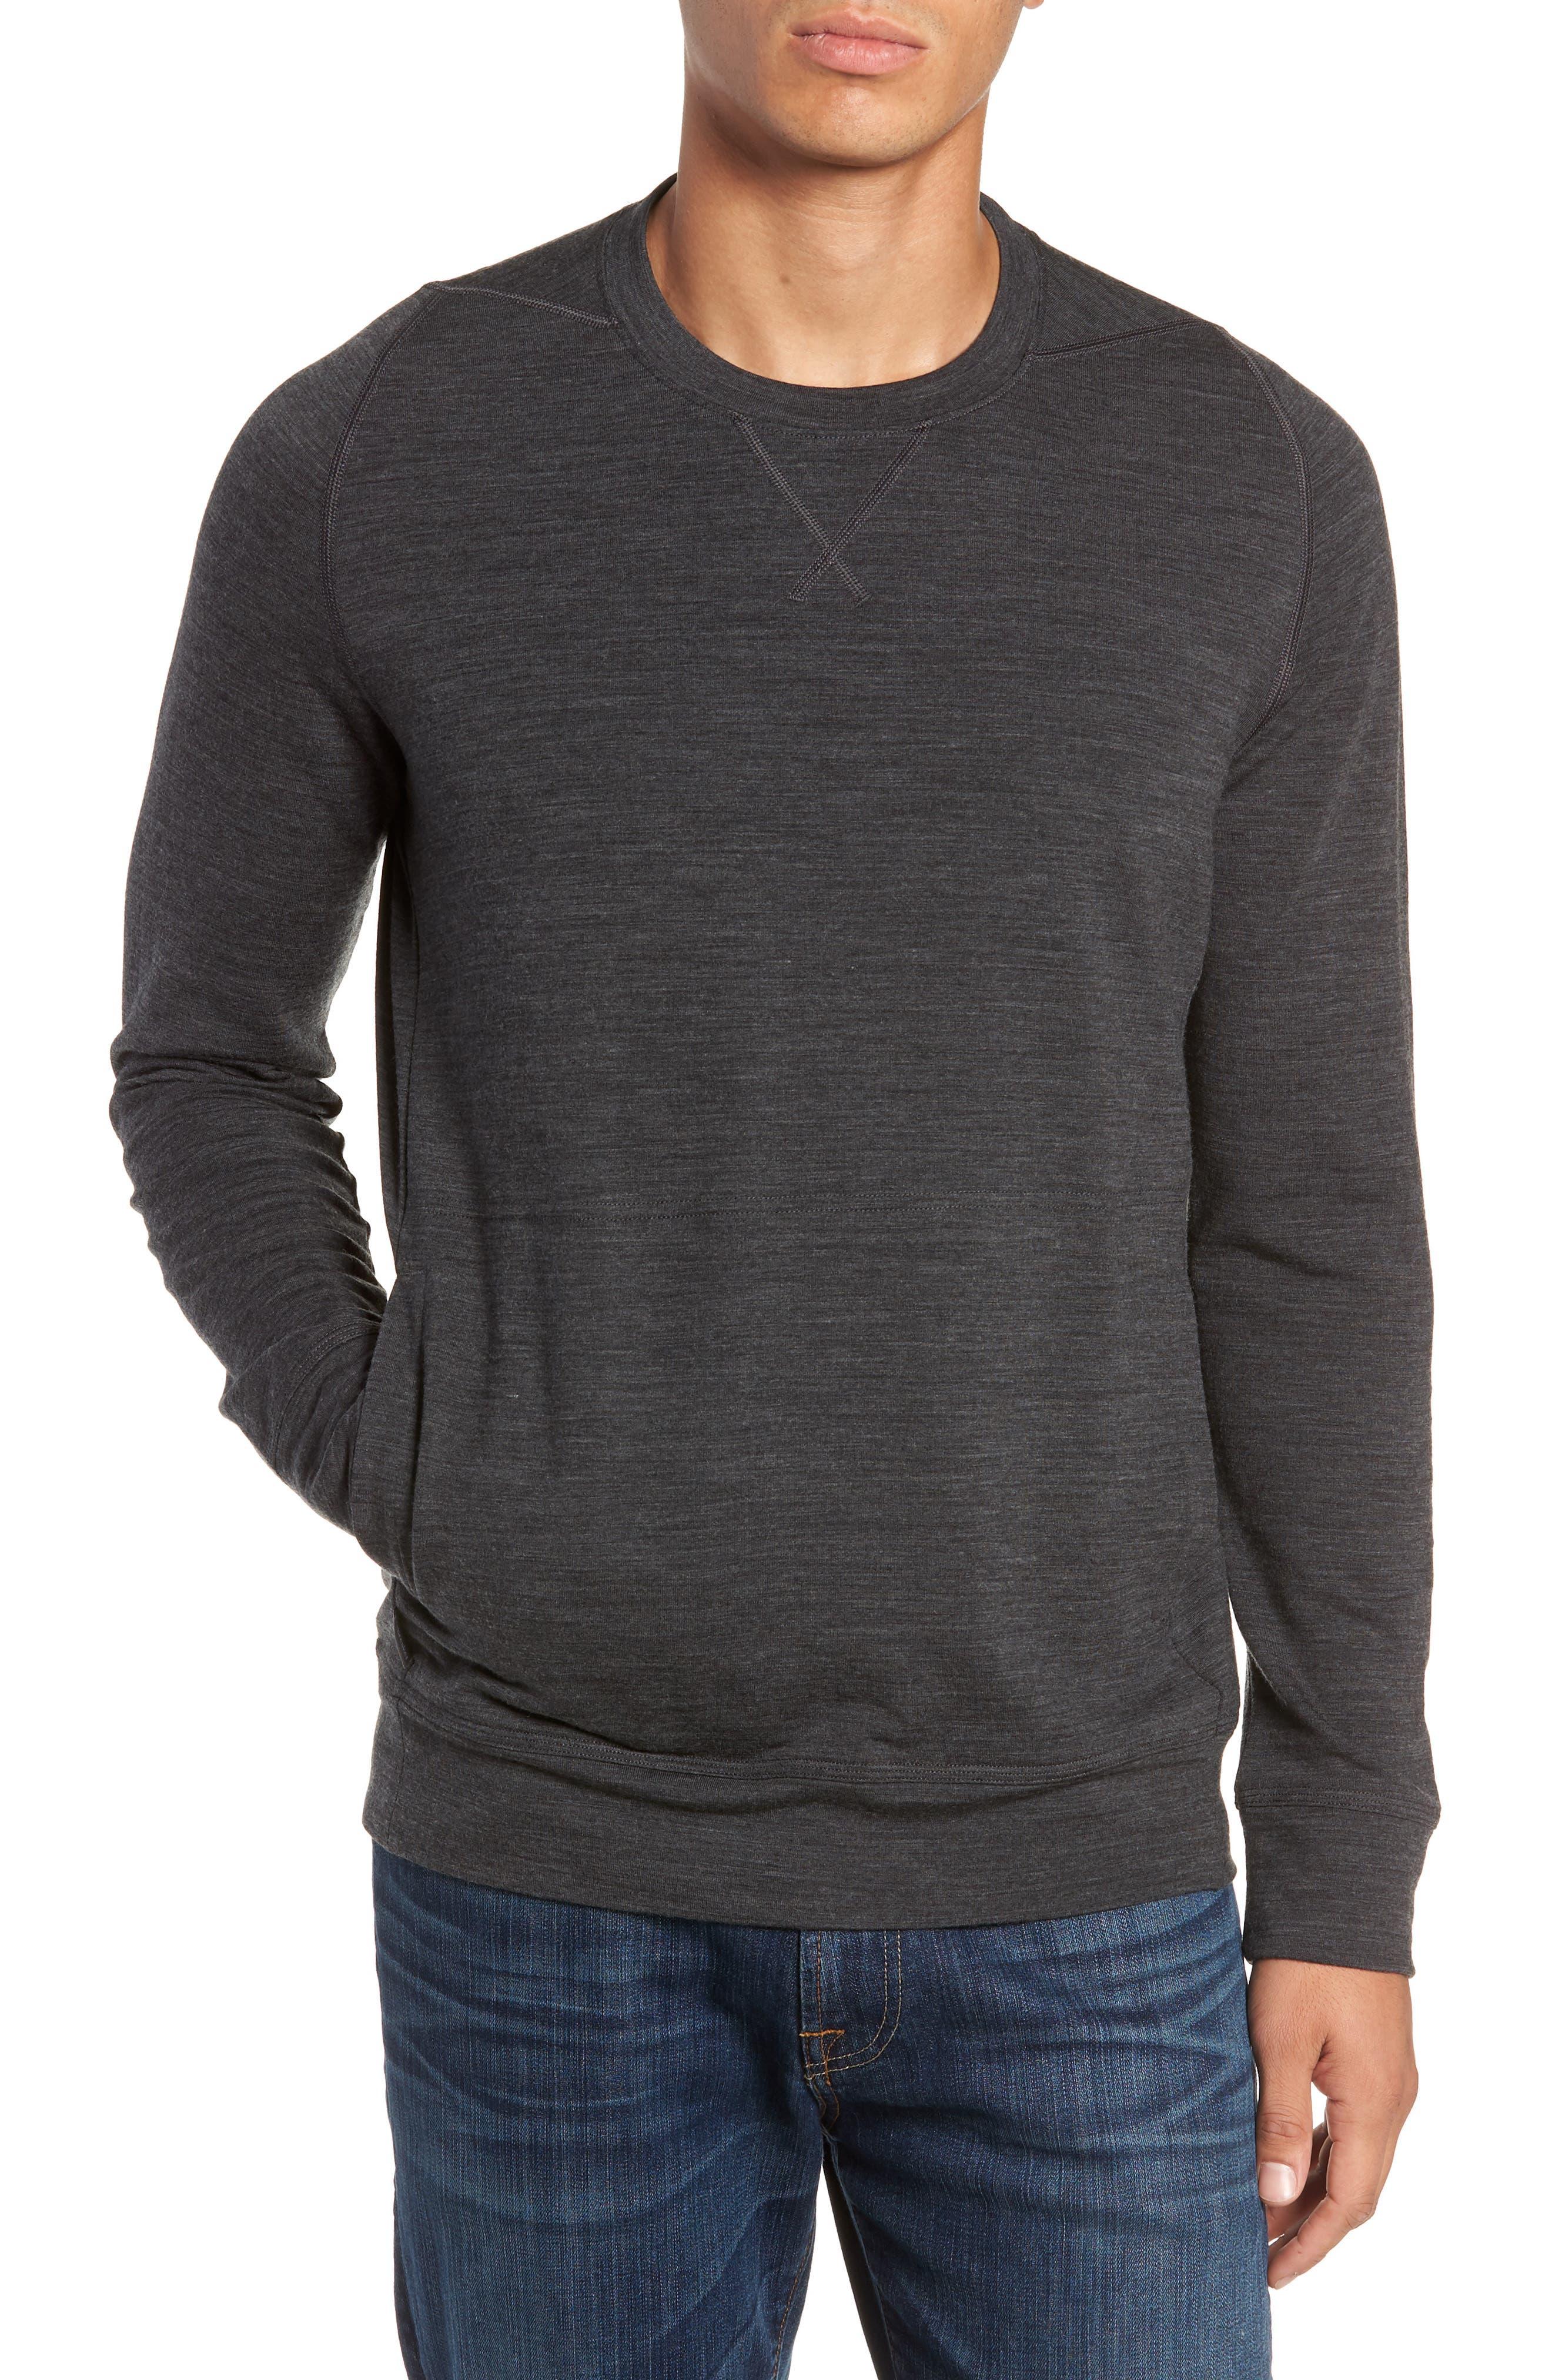 Shifter Merino Wool Blend Crewneck Sweater,                         Main,                         color, JET HEATHER